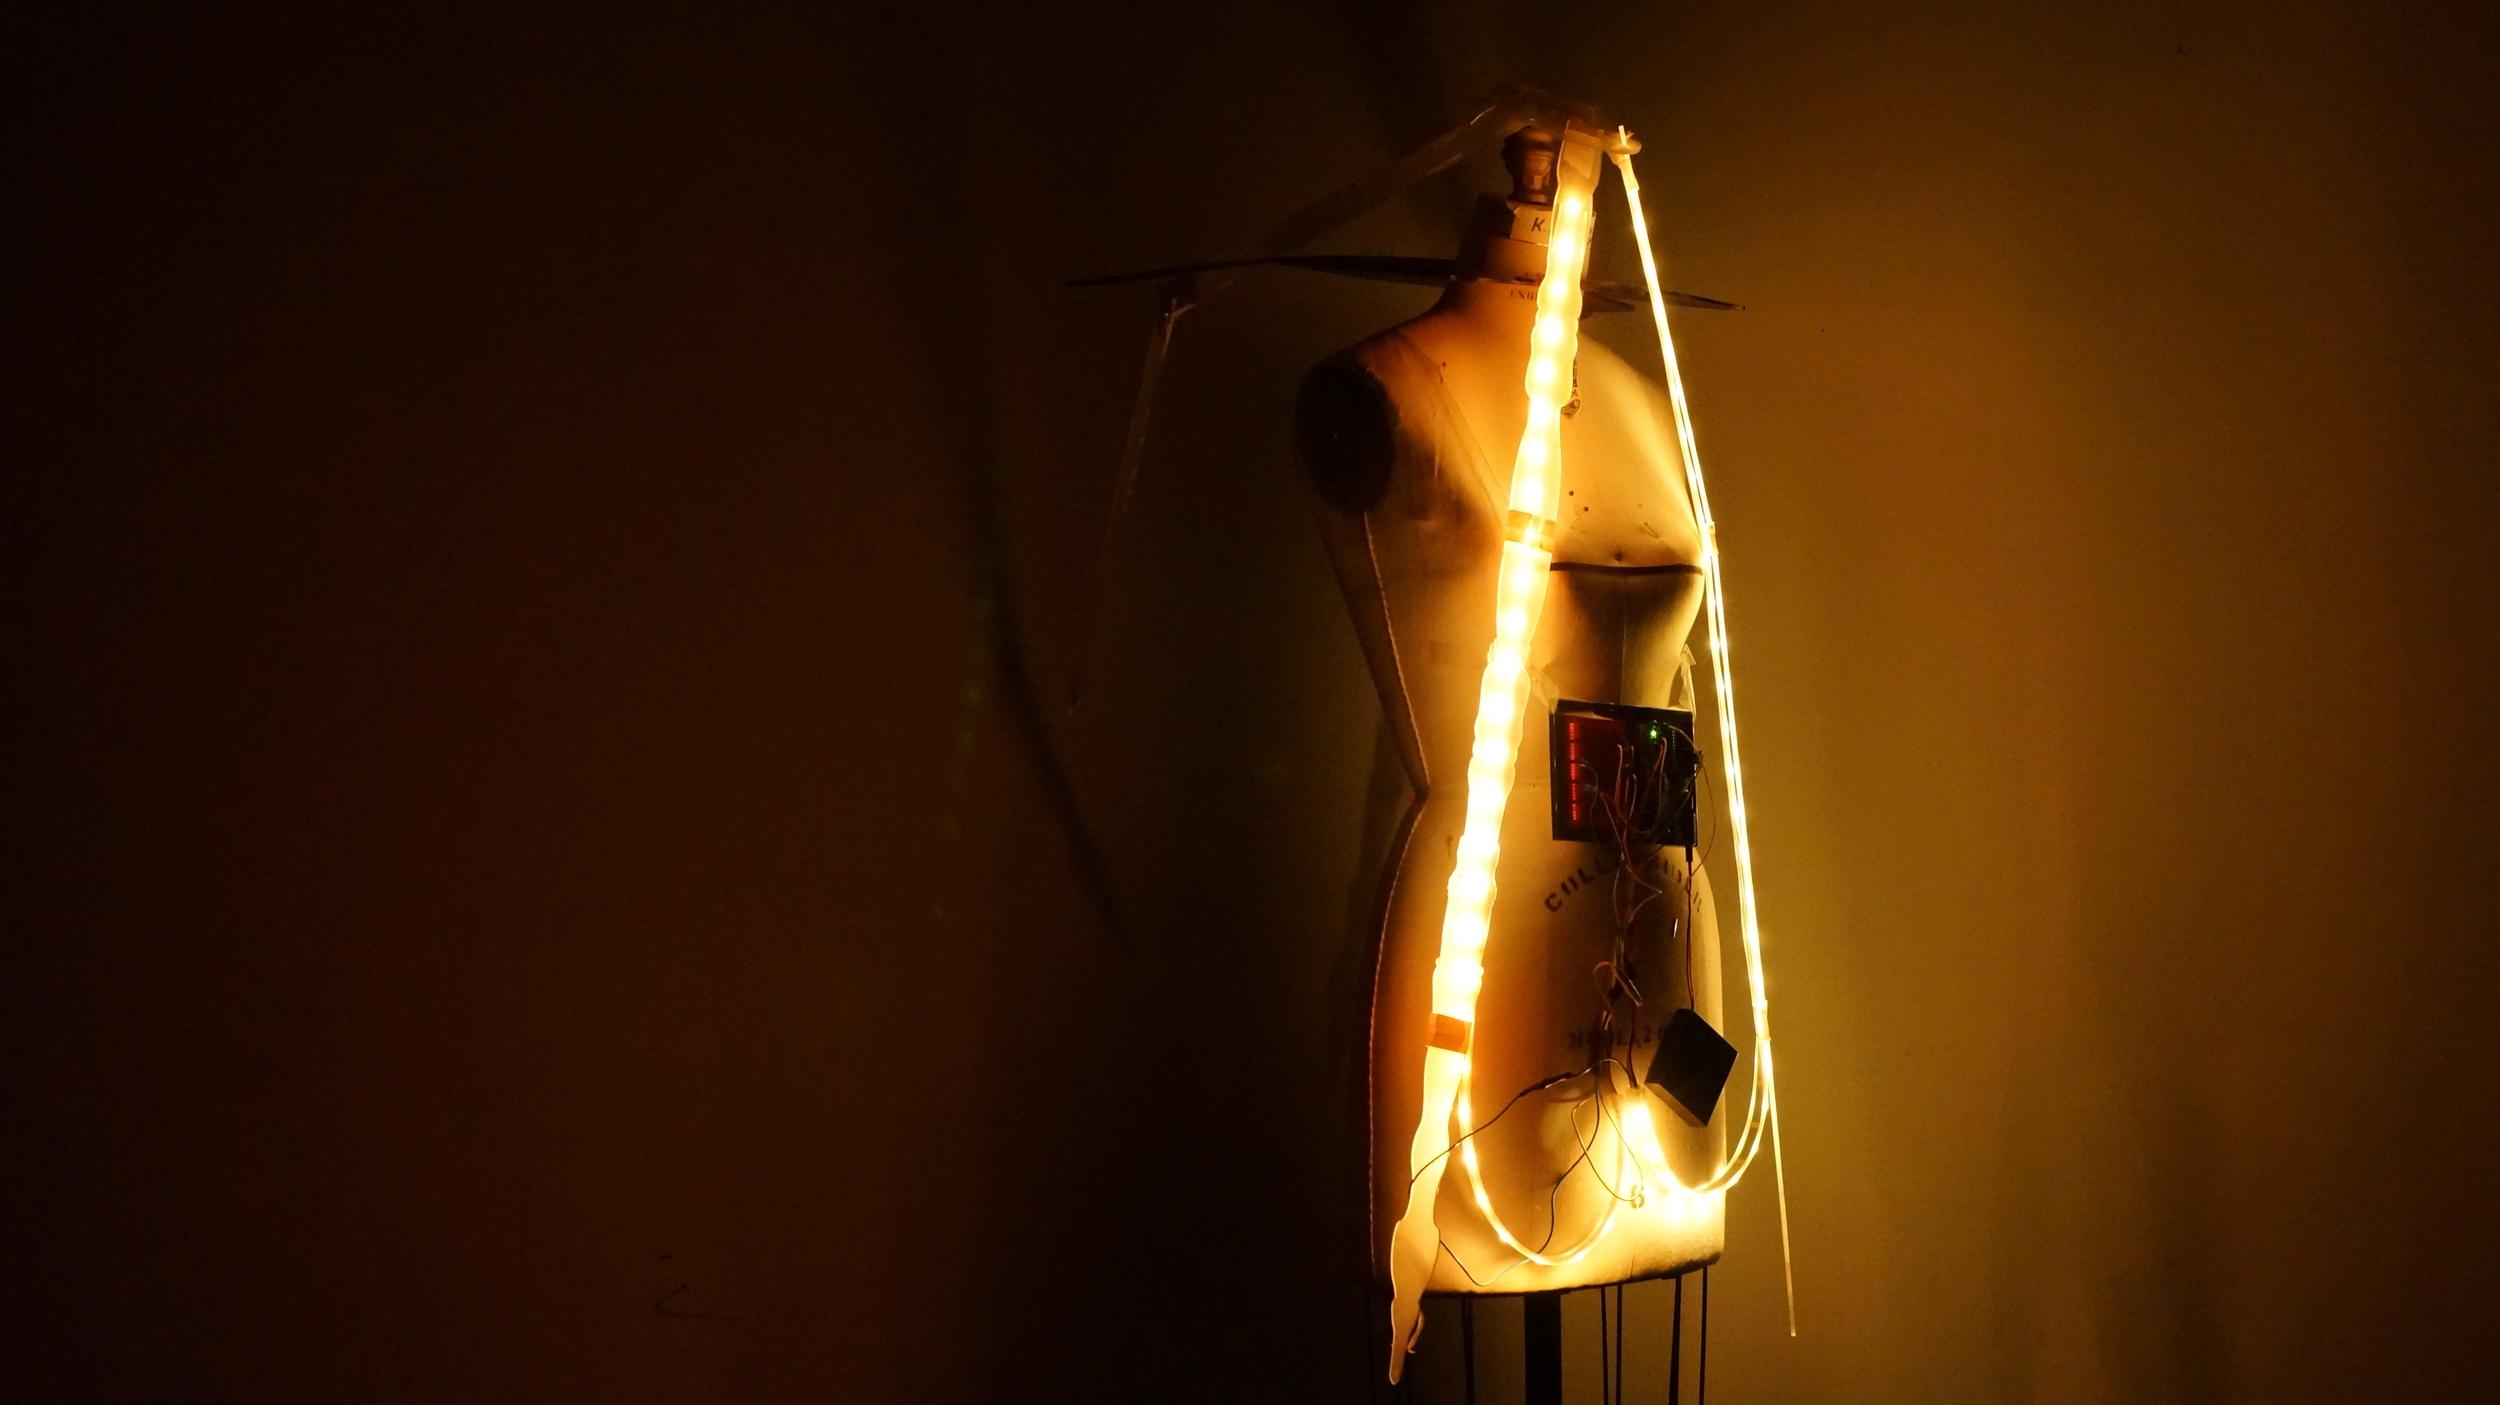 Prototype: Light effect on acrylic shapes